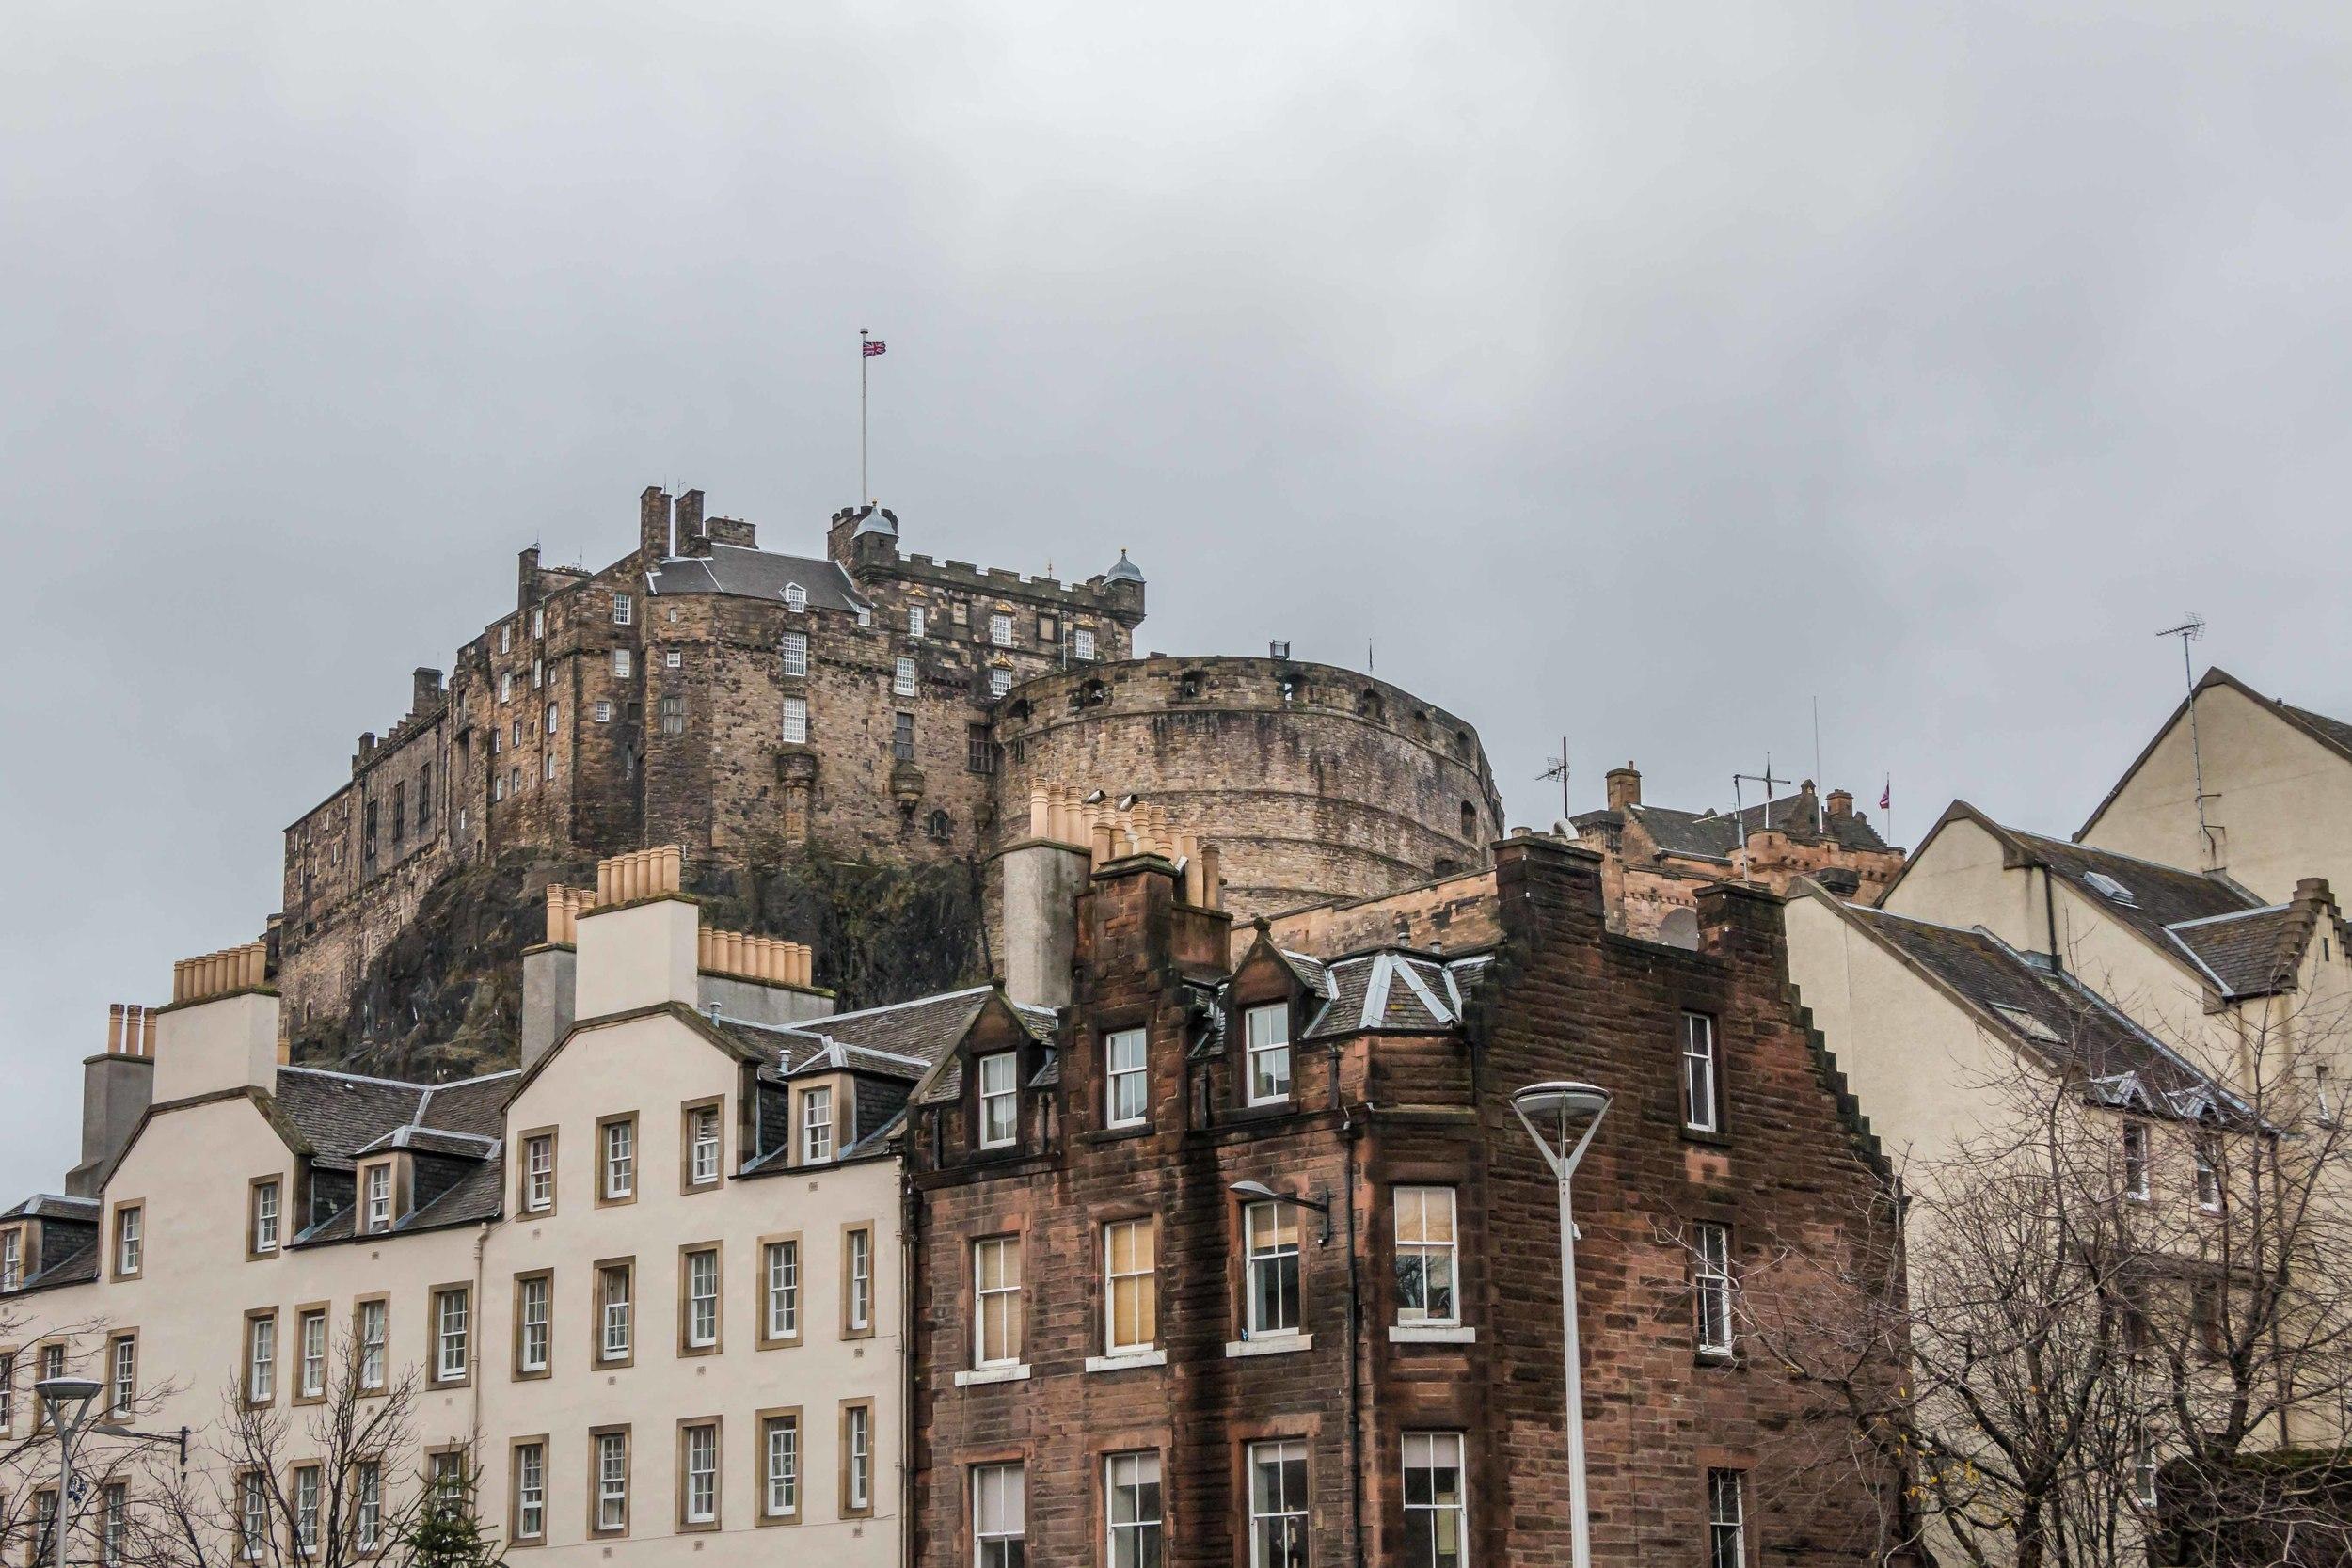 SOA_Edinburgh-Scotland-grassmarket-castle.jpg